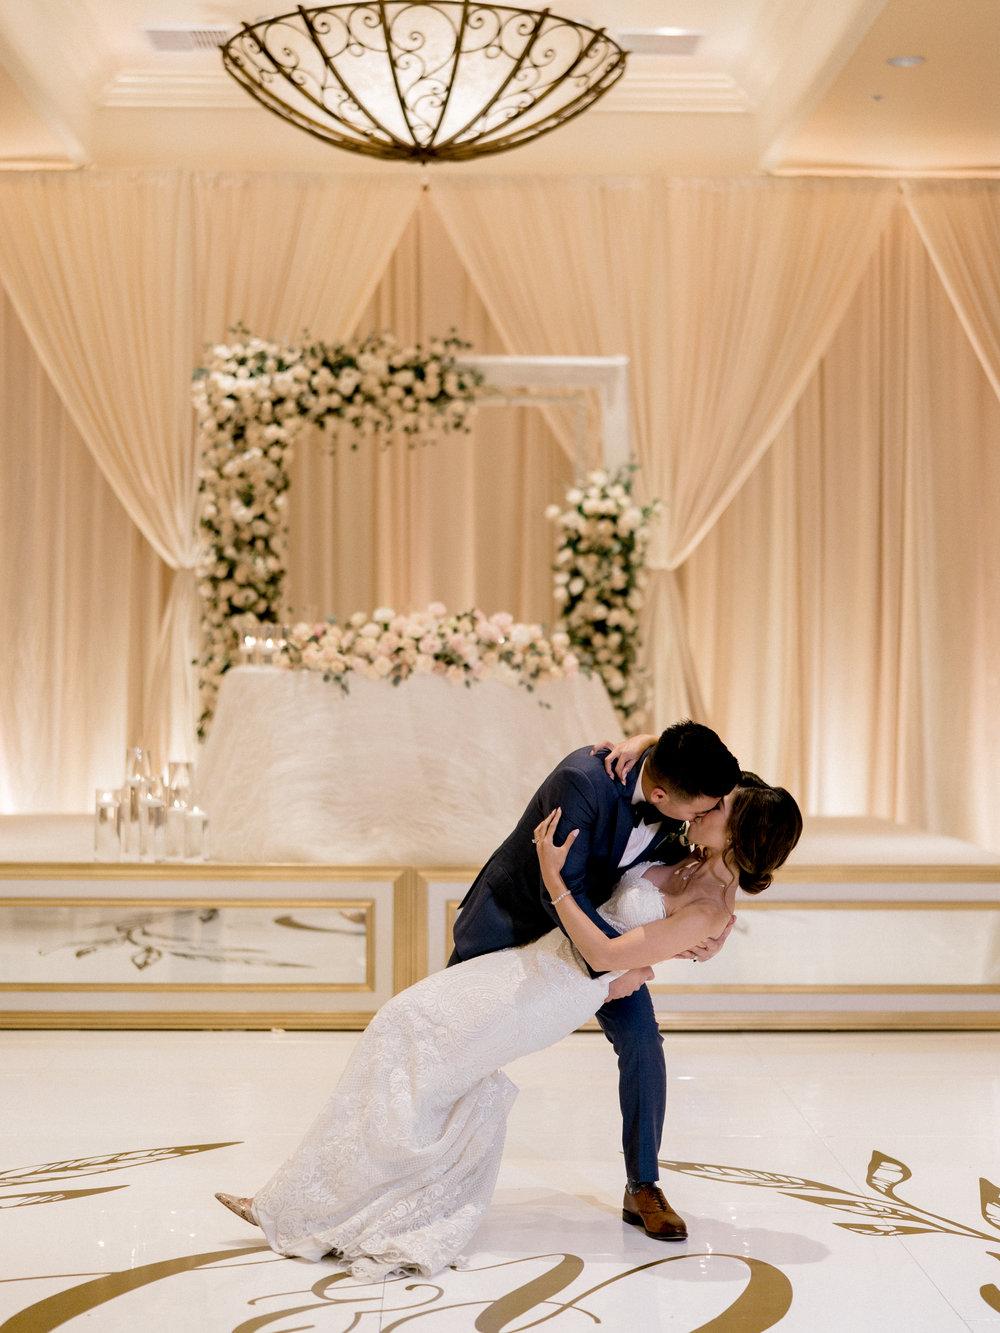 ChristineDomJonCu-Film-Wedding-Photographer171.jpg